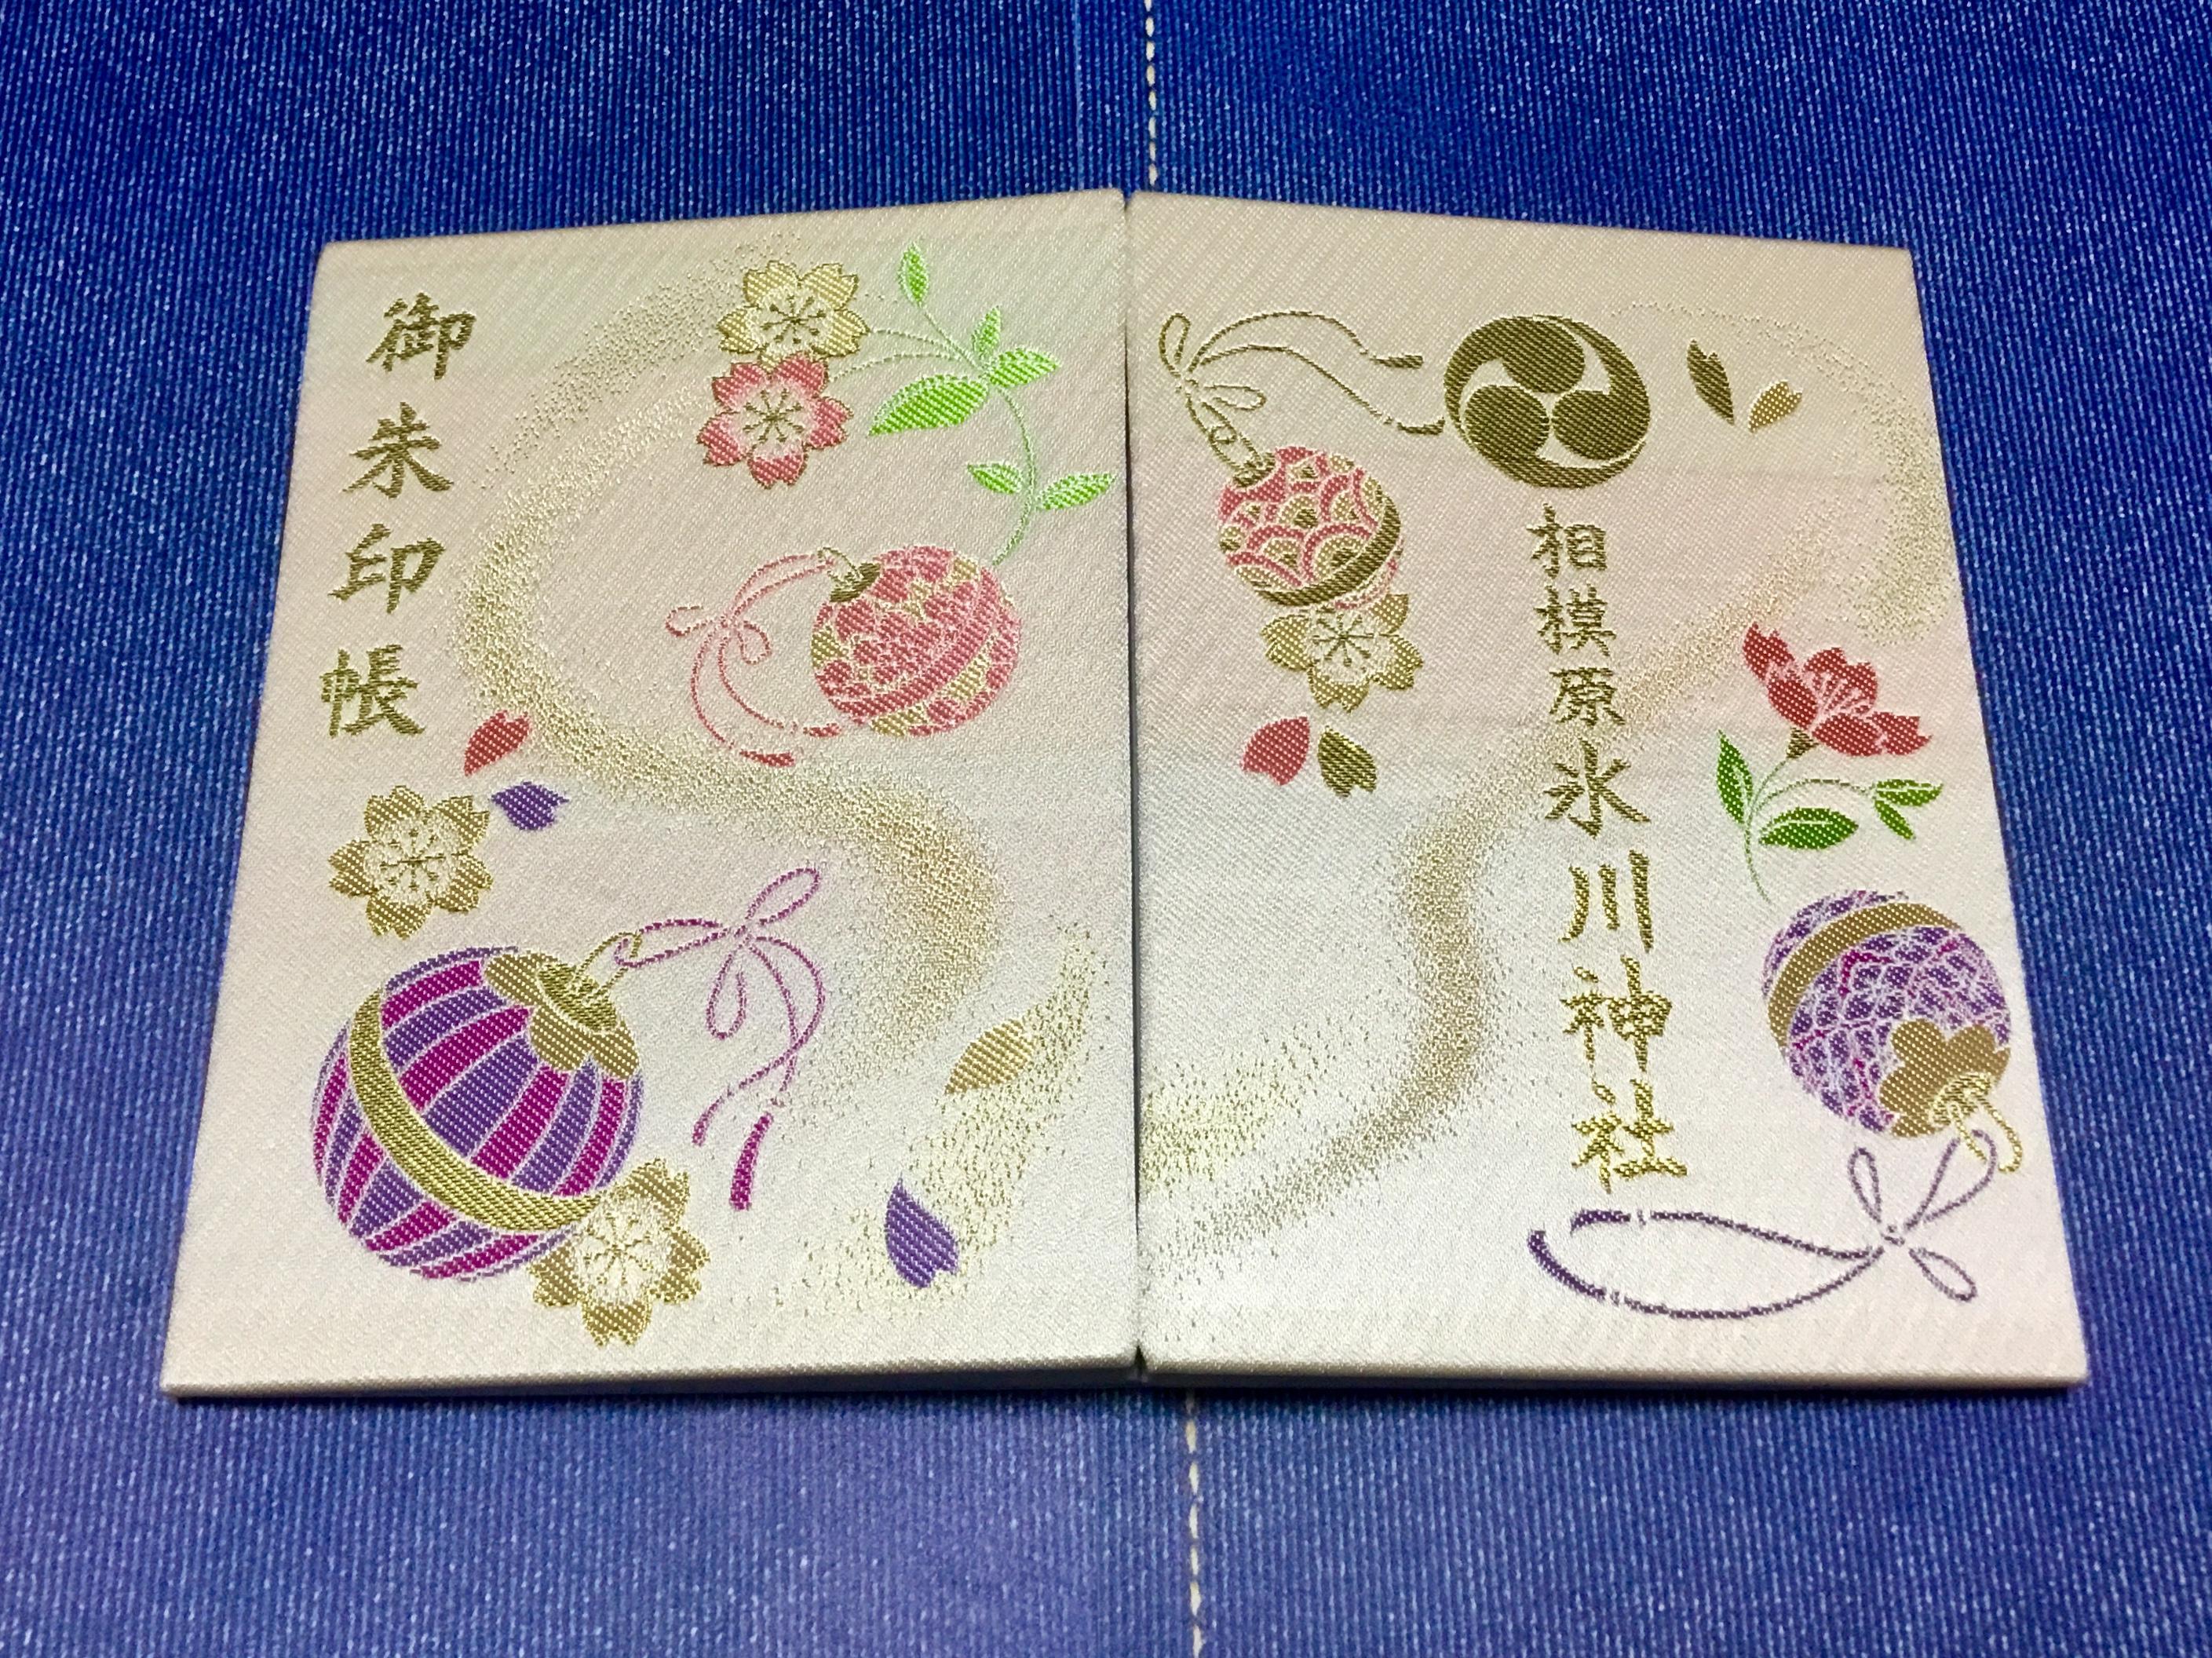 相模原氷川神社の御朱印帳